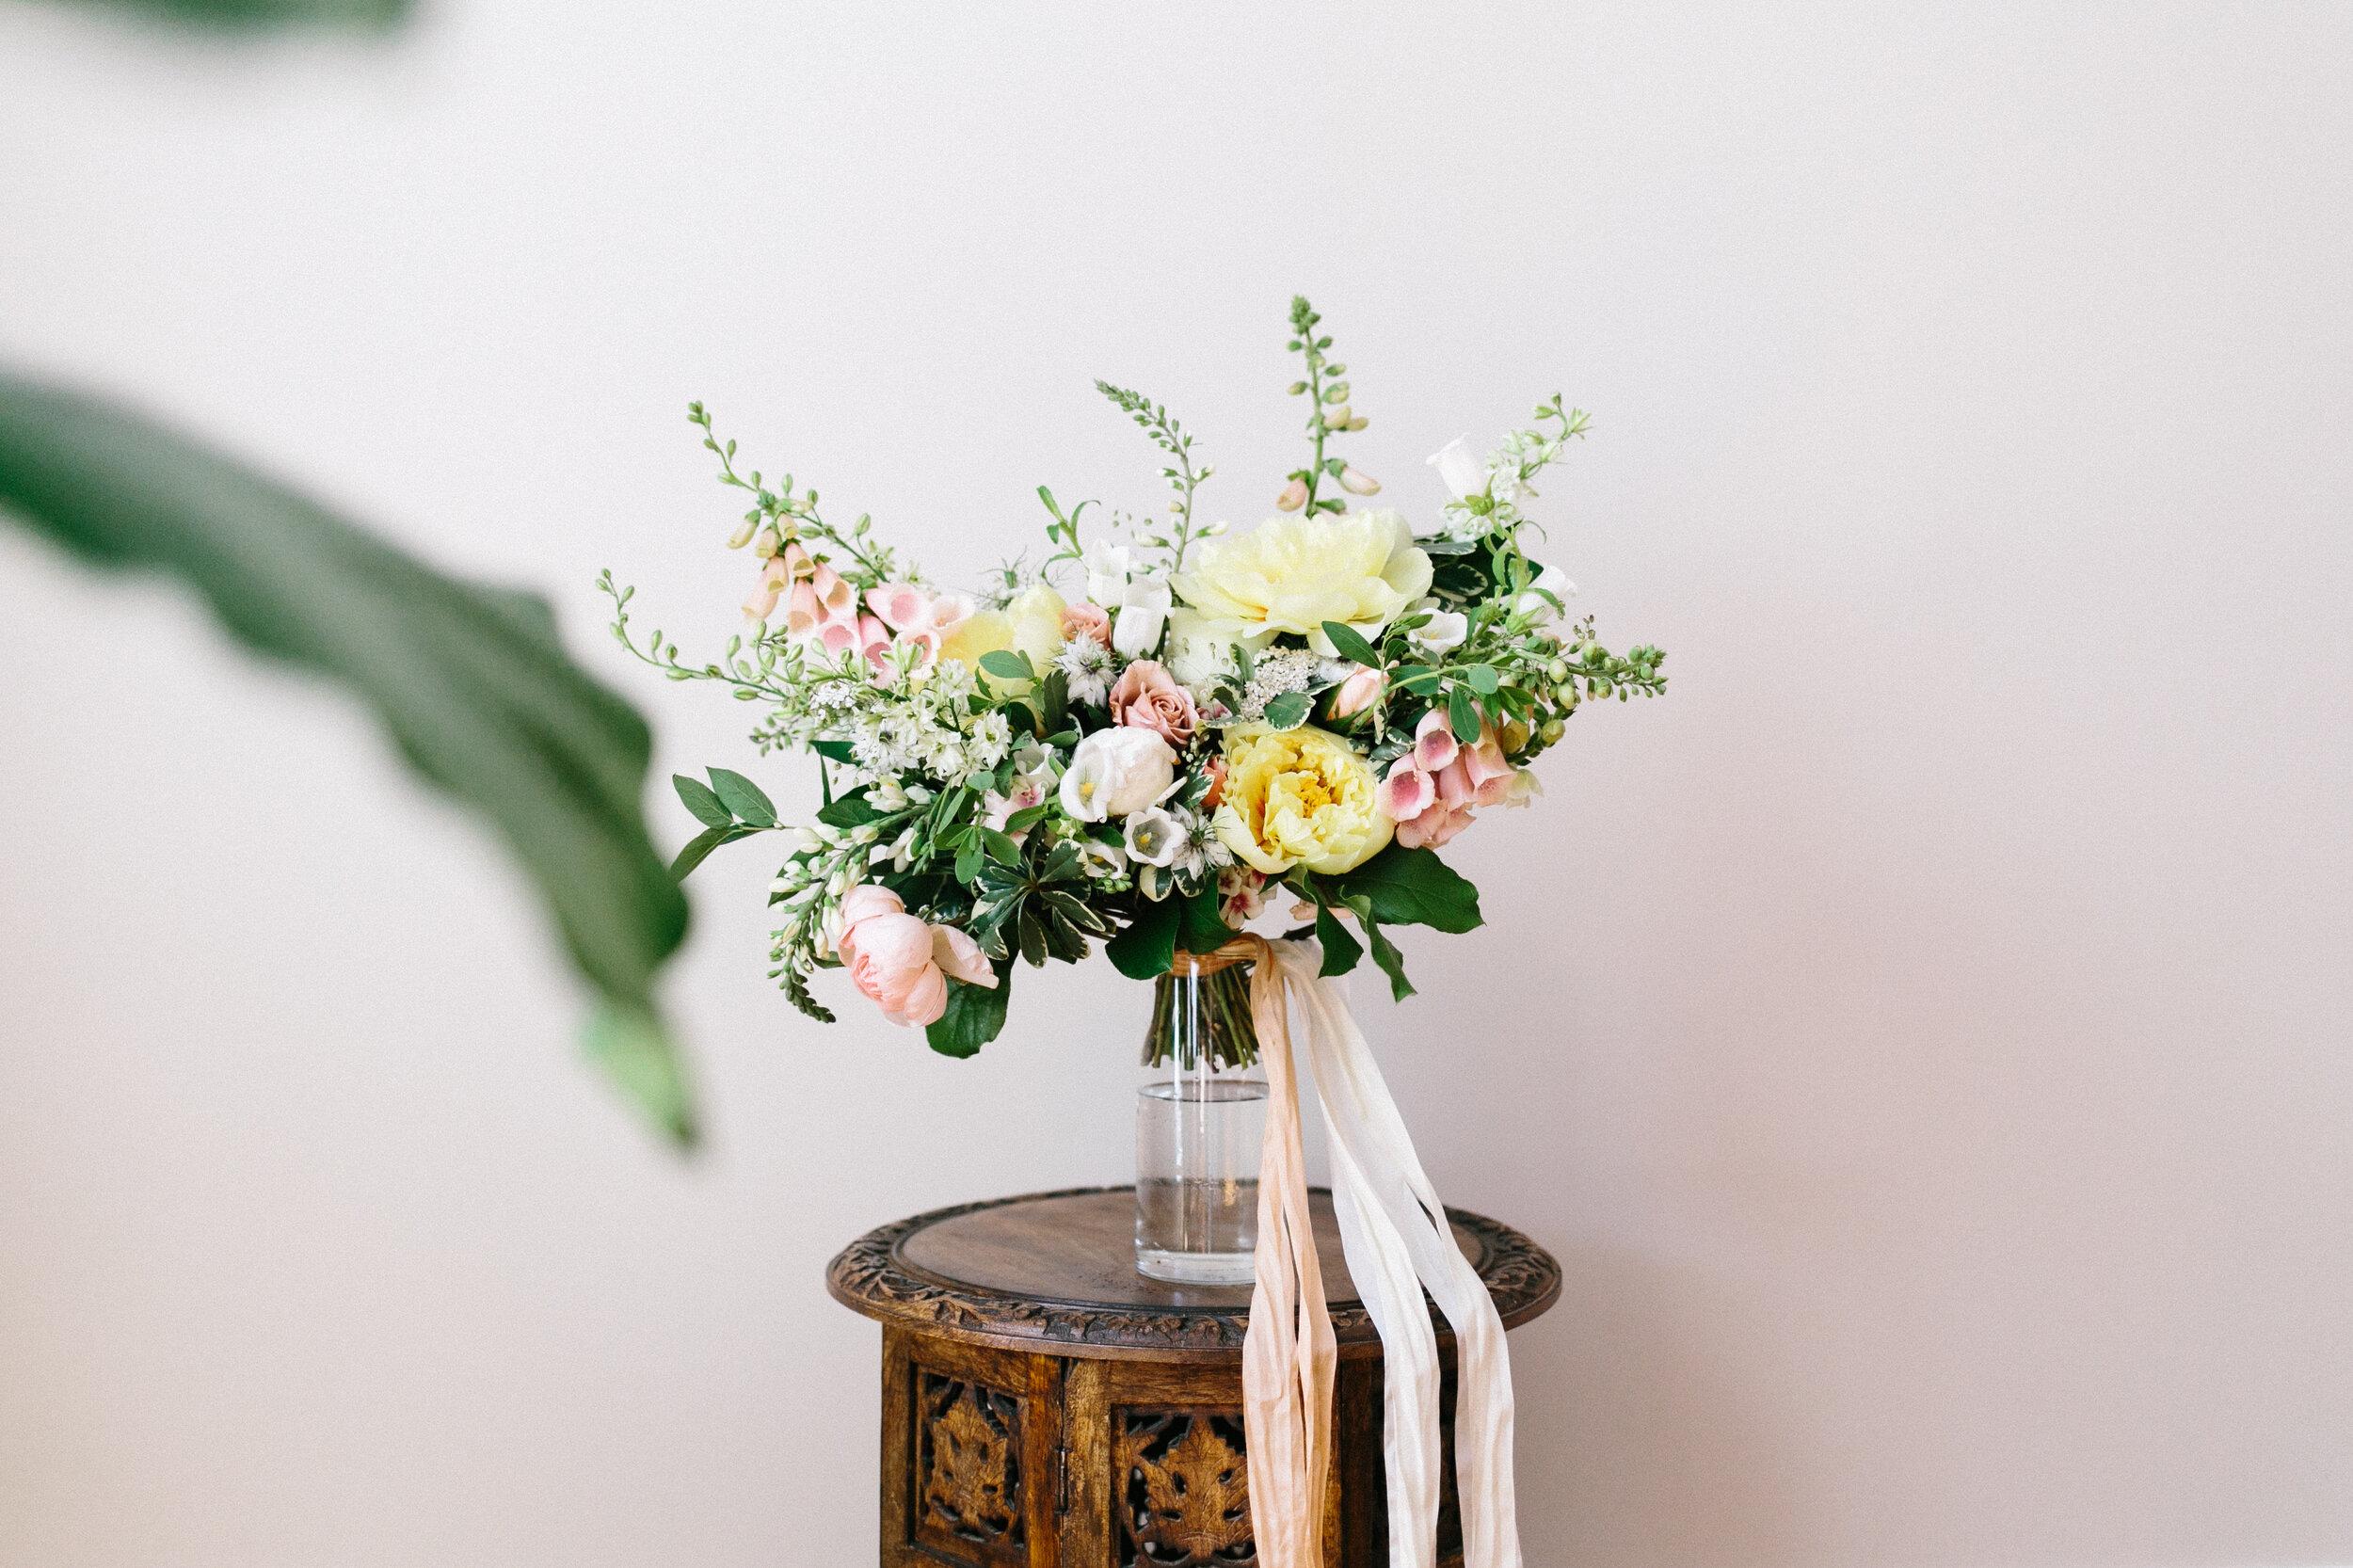 pinestate_flowers_bridal_bouquet